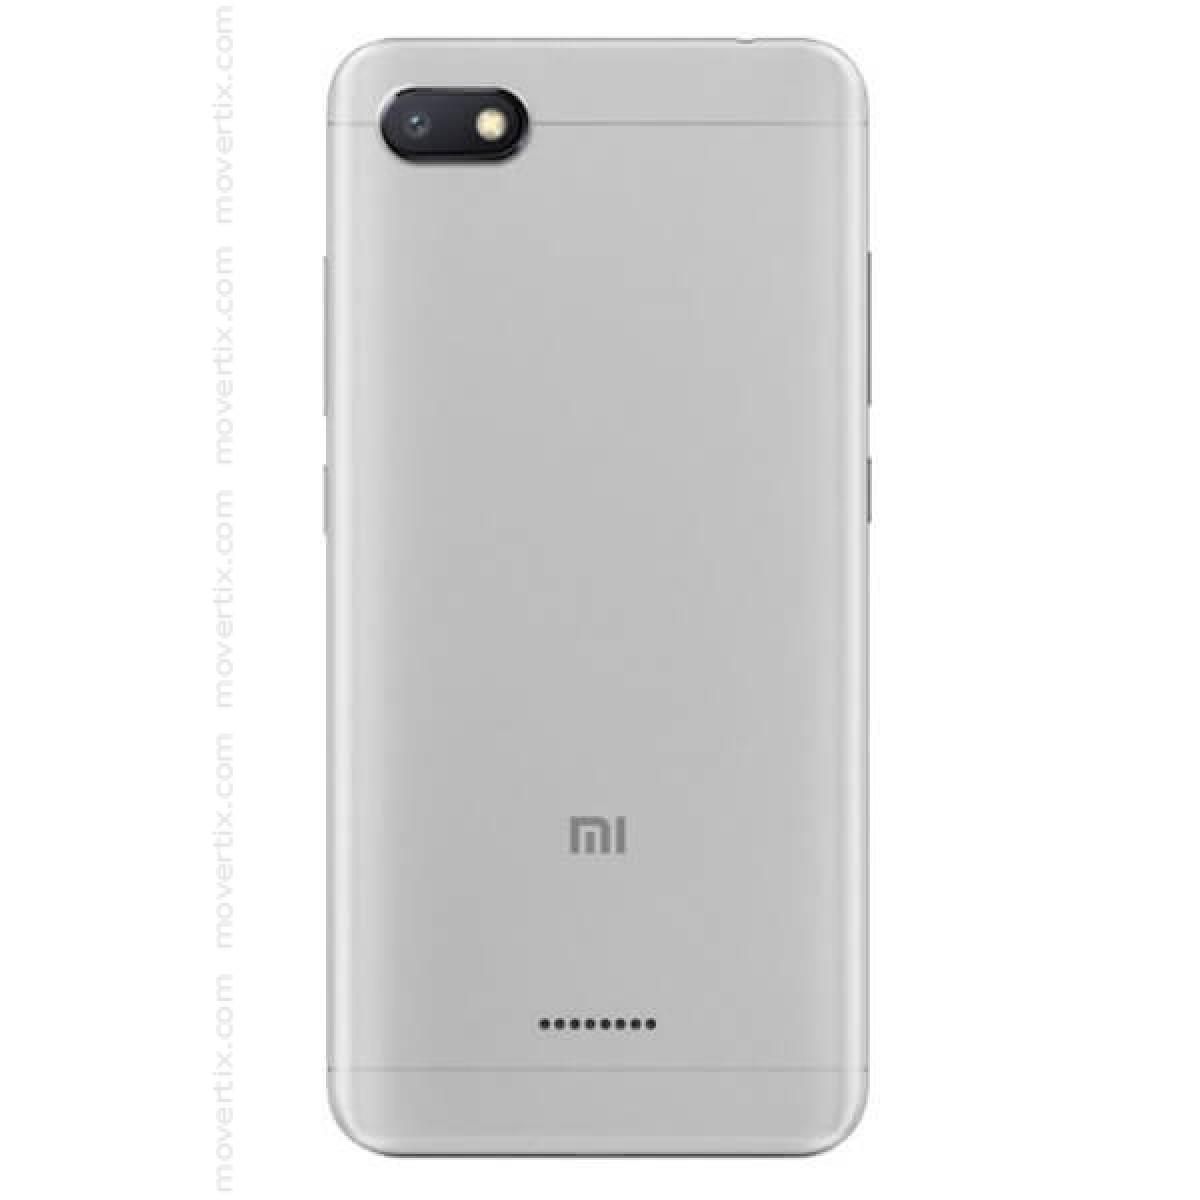 Xiaomi Redmi 6a Dual Sim Grey 32gb And 2gb Ram 6941059608493 Note 2 Gb Internal 16 Movertix Mobile Phones Shop